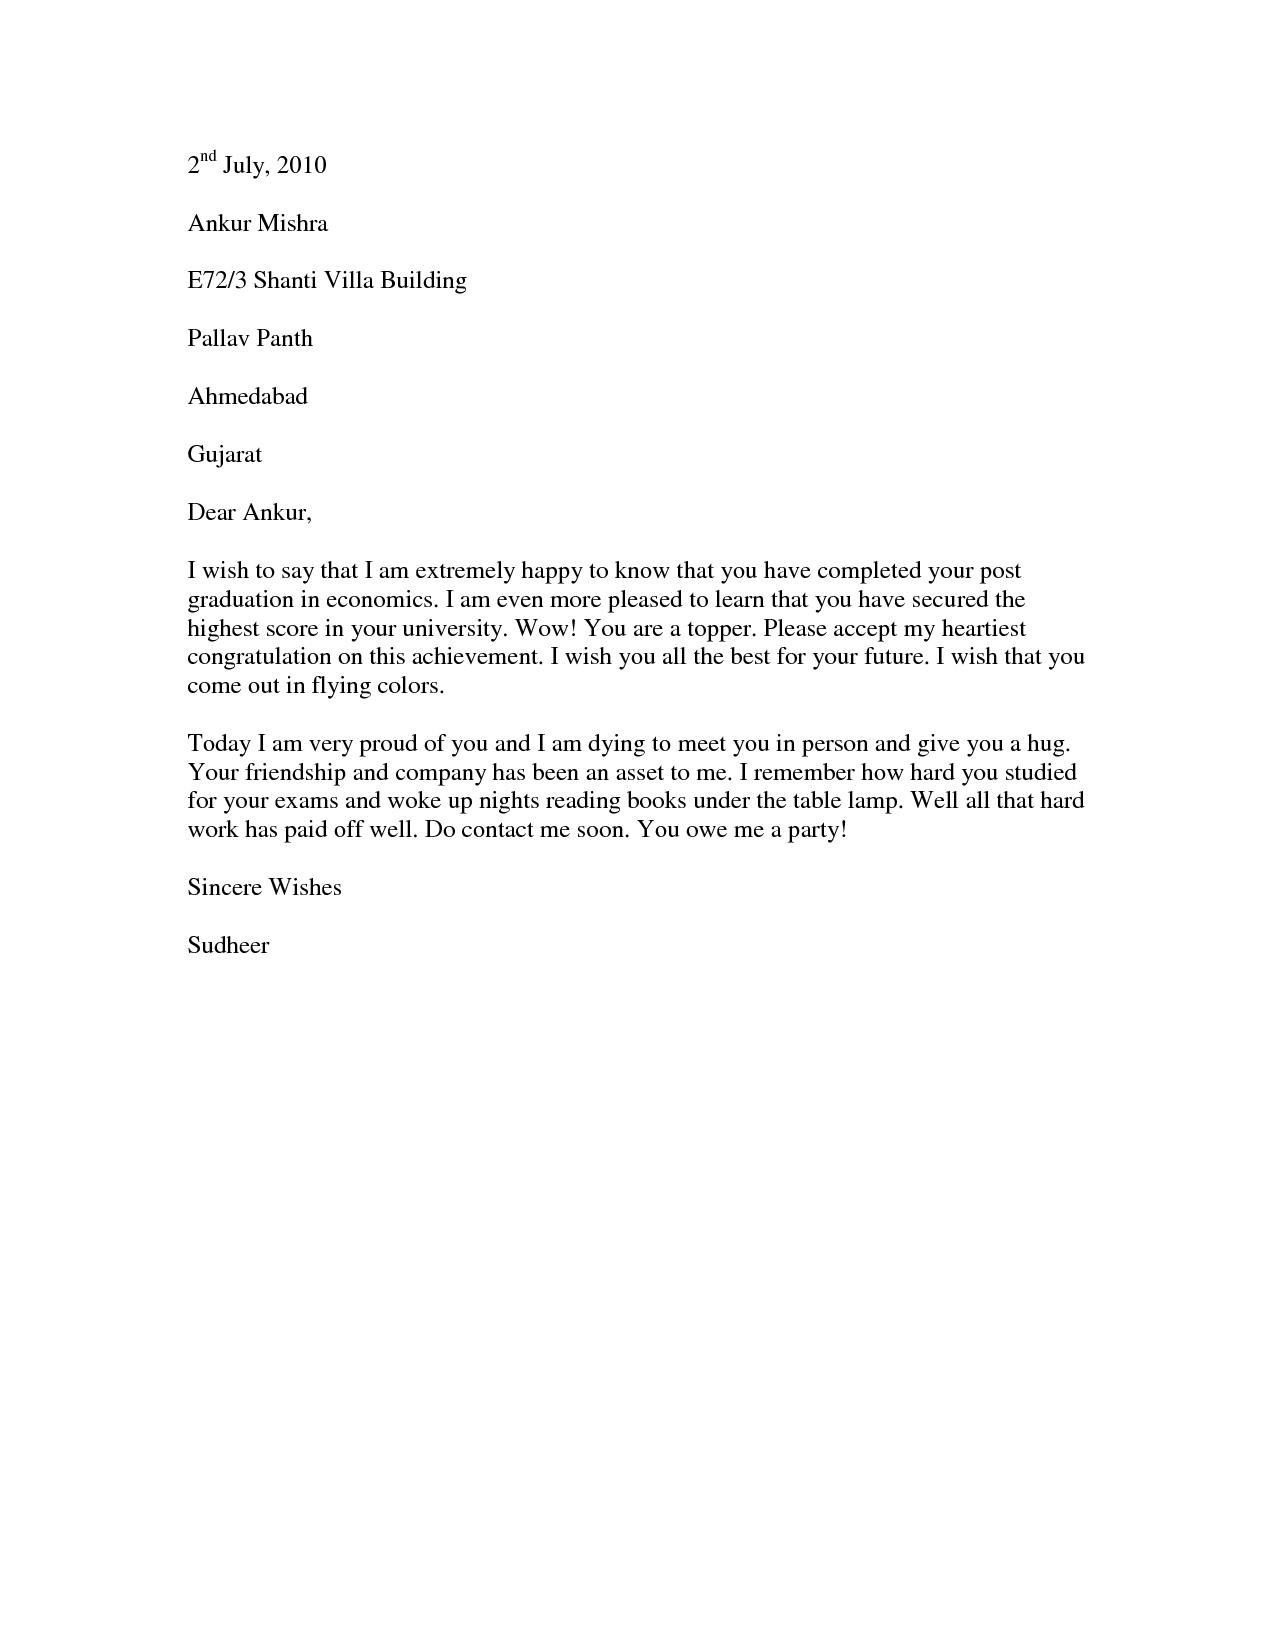 congratulation letter for new job